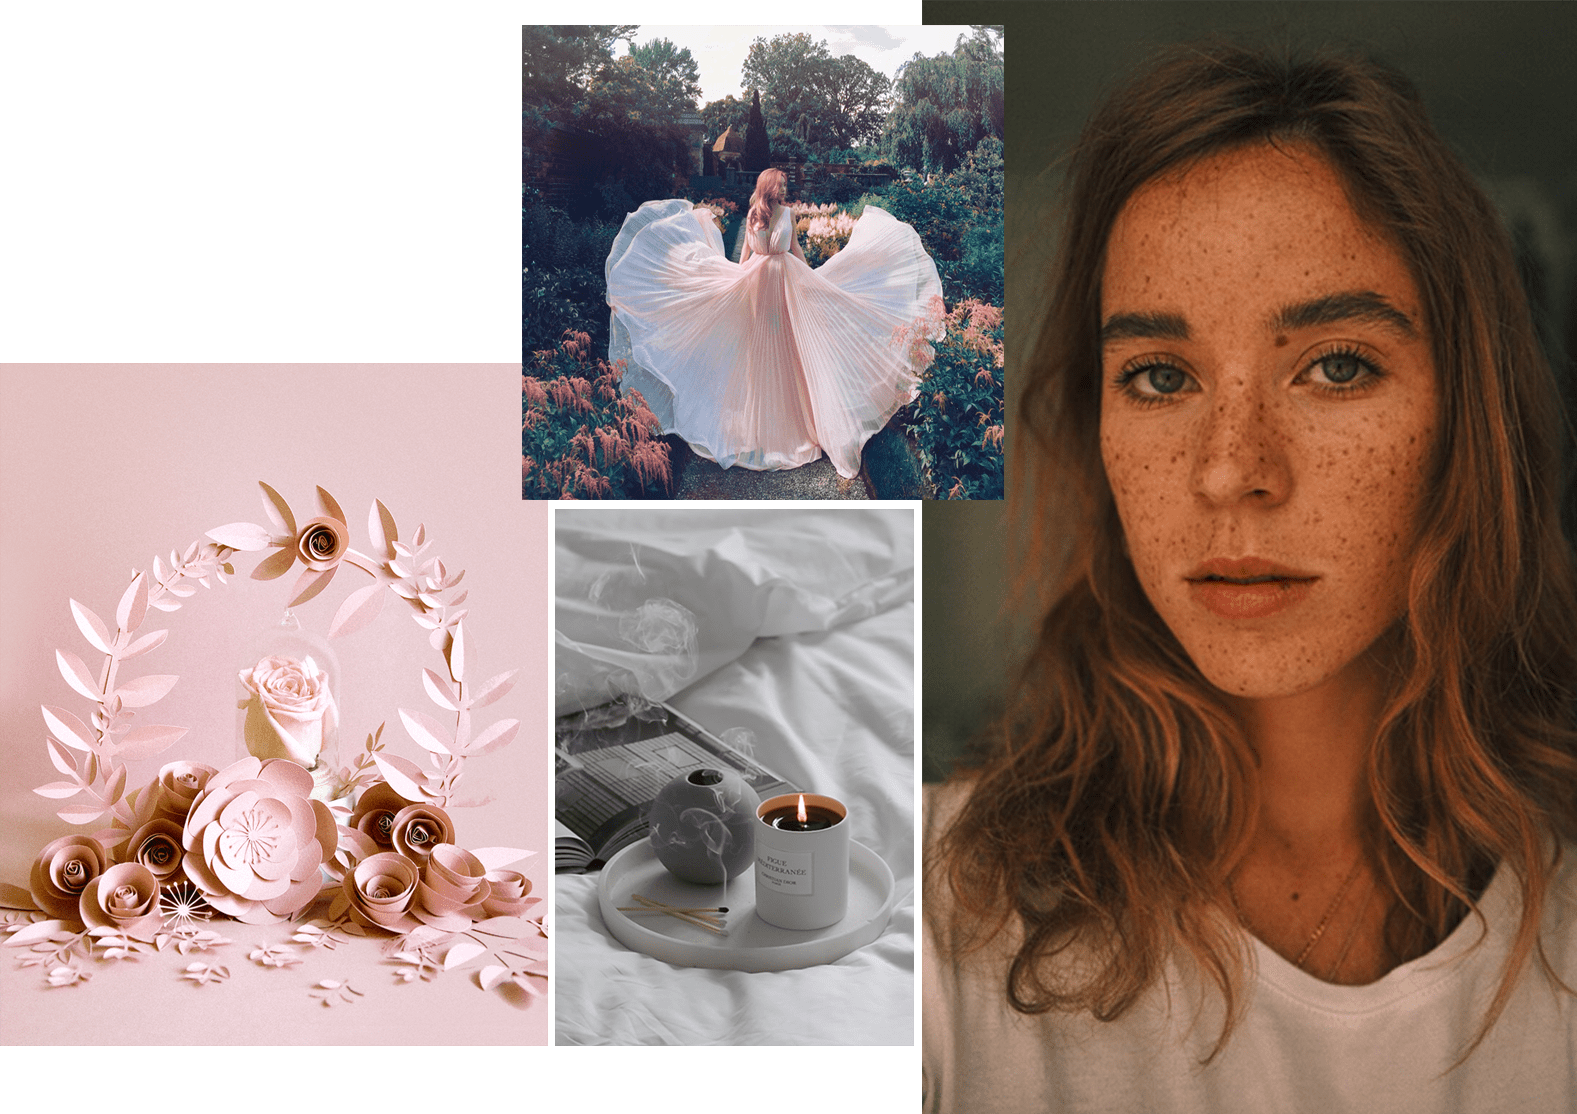 Dior creators composition